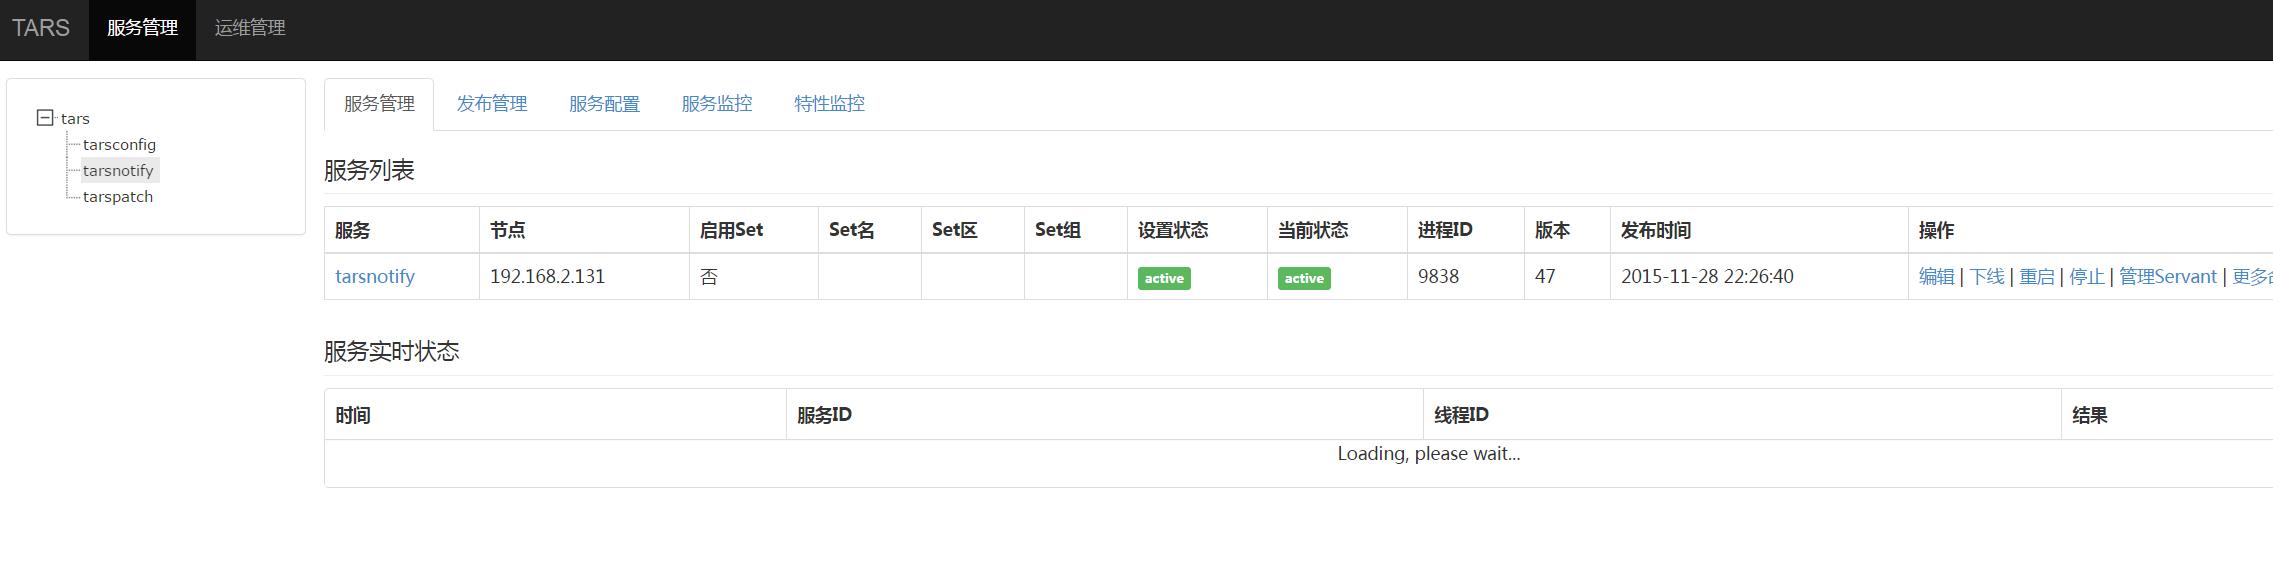 Linux菜鸟一键安装腾讯开发框架Tars的小记